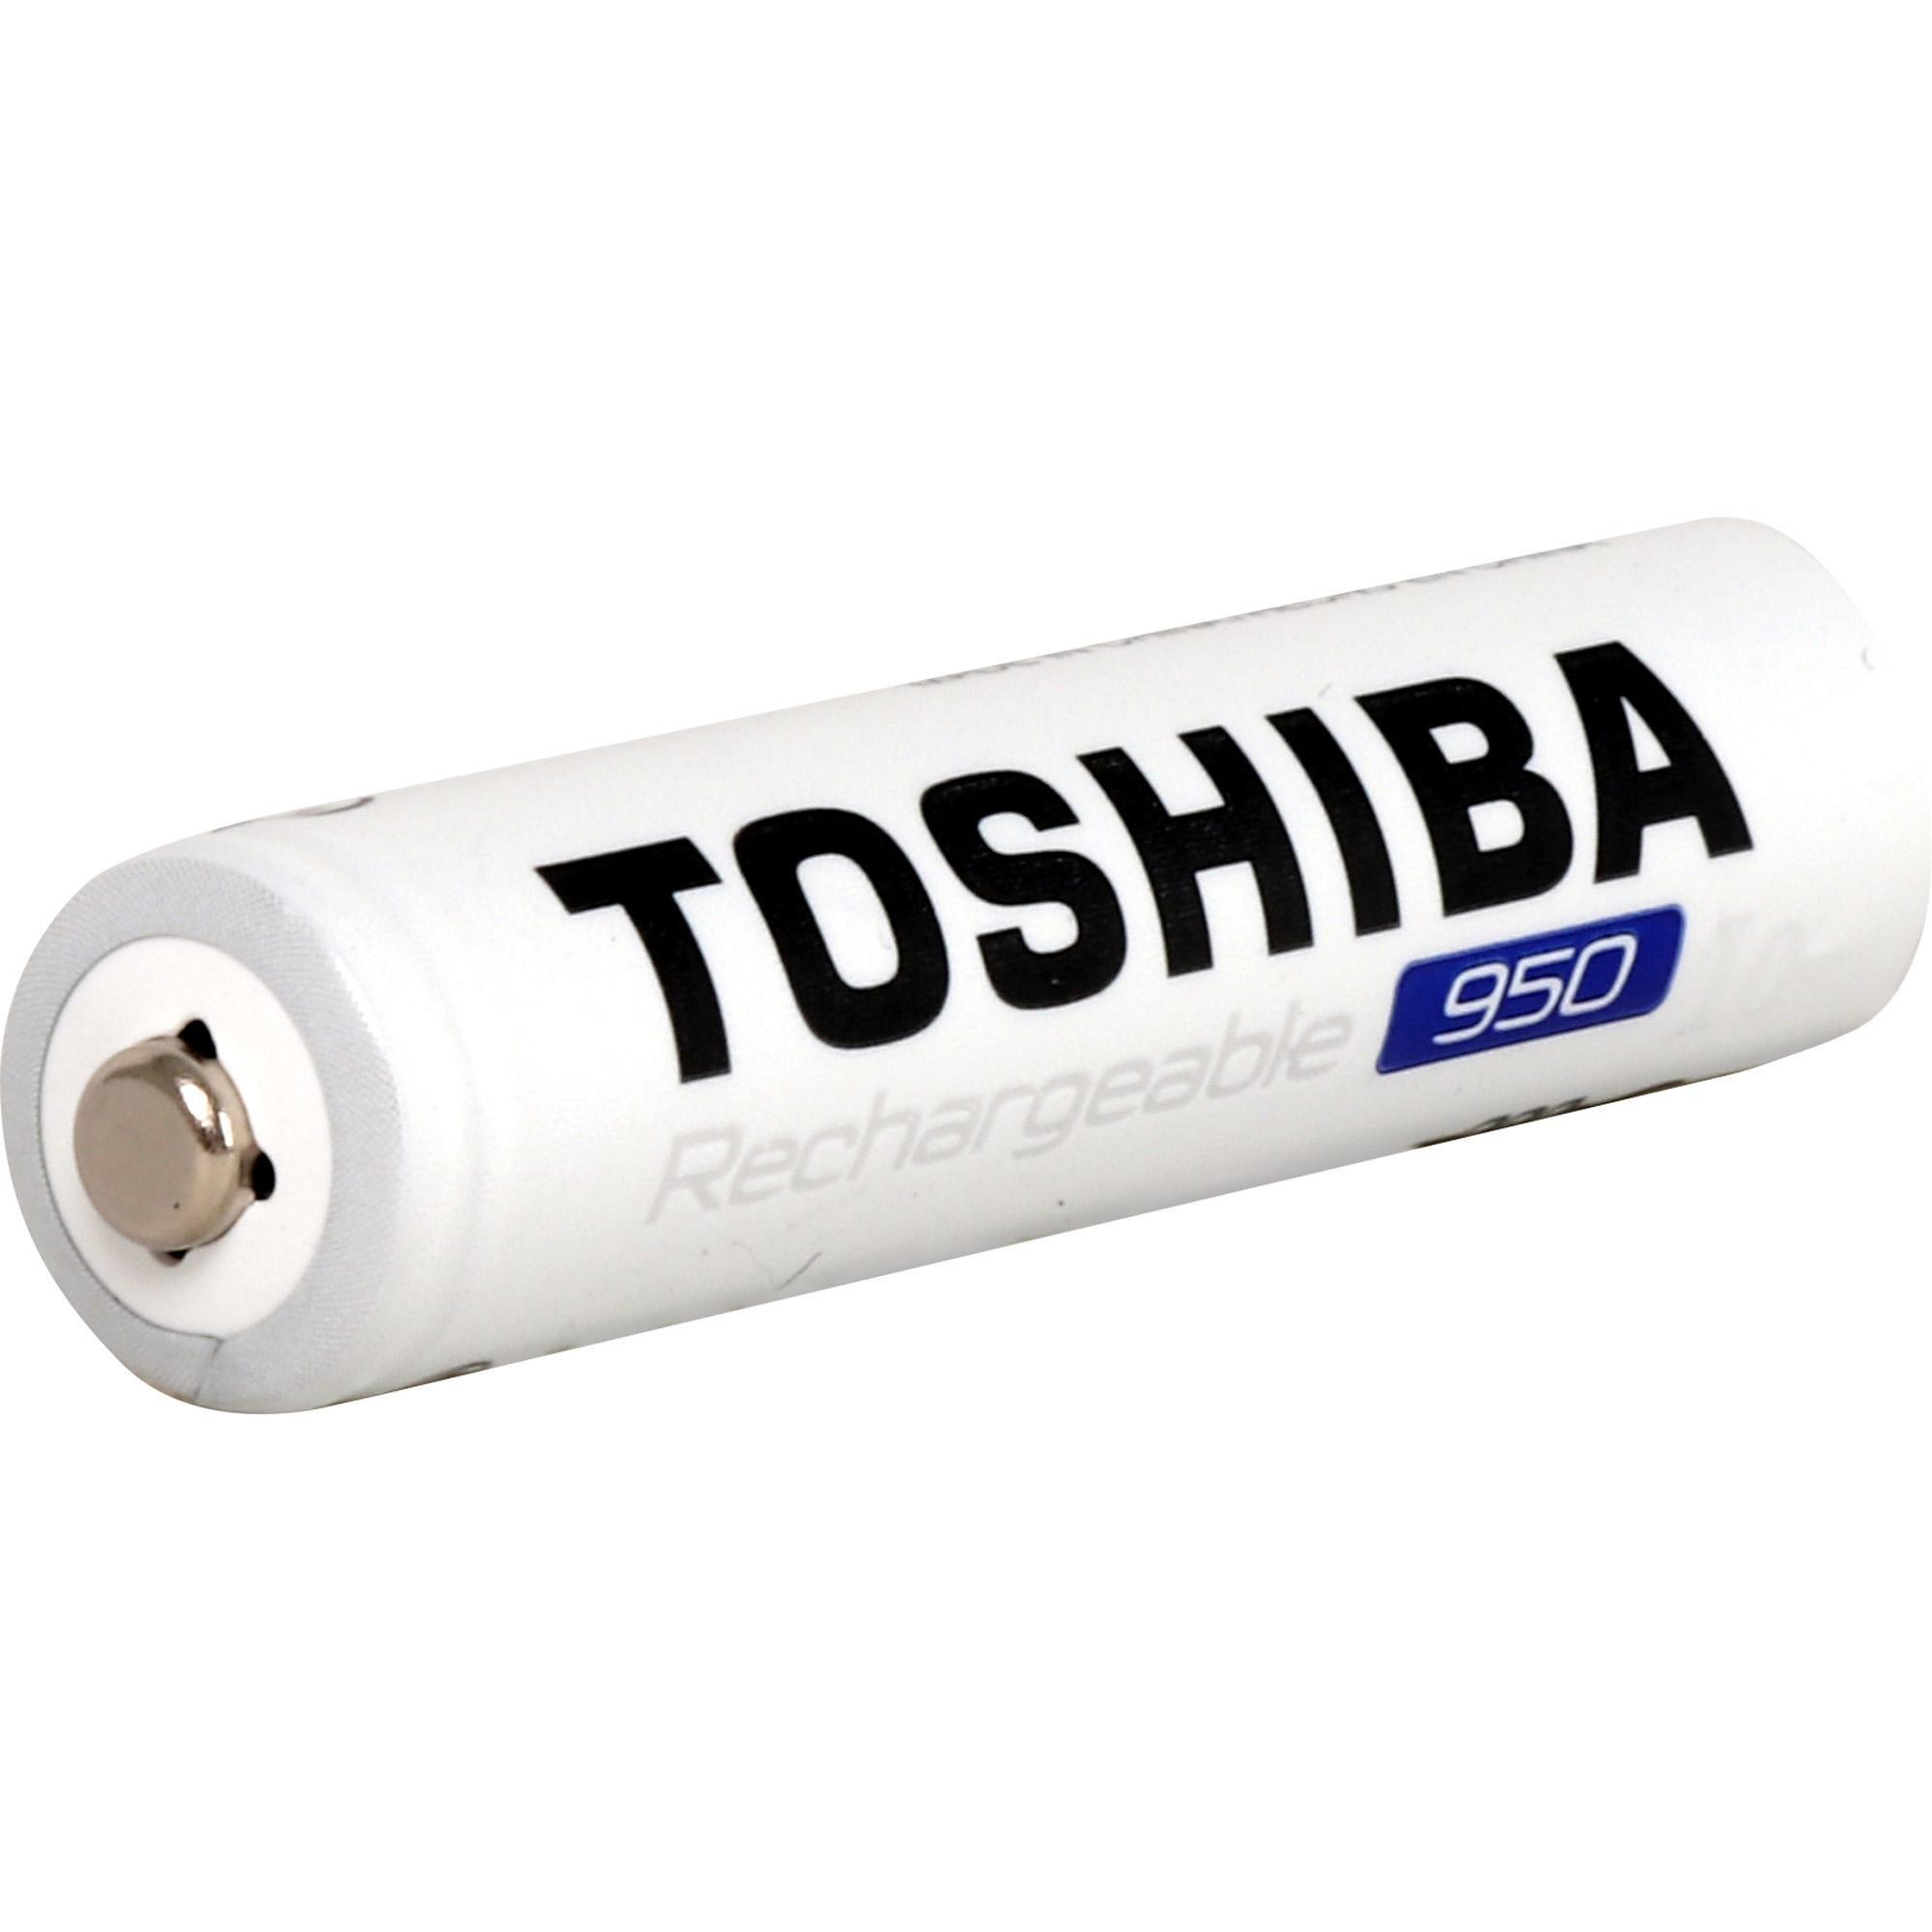 6 Pilhas Recarregáveis Aaa Palito 950Mah Toshiba TNH-03GAE BP-2C